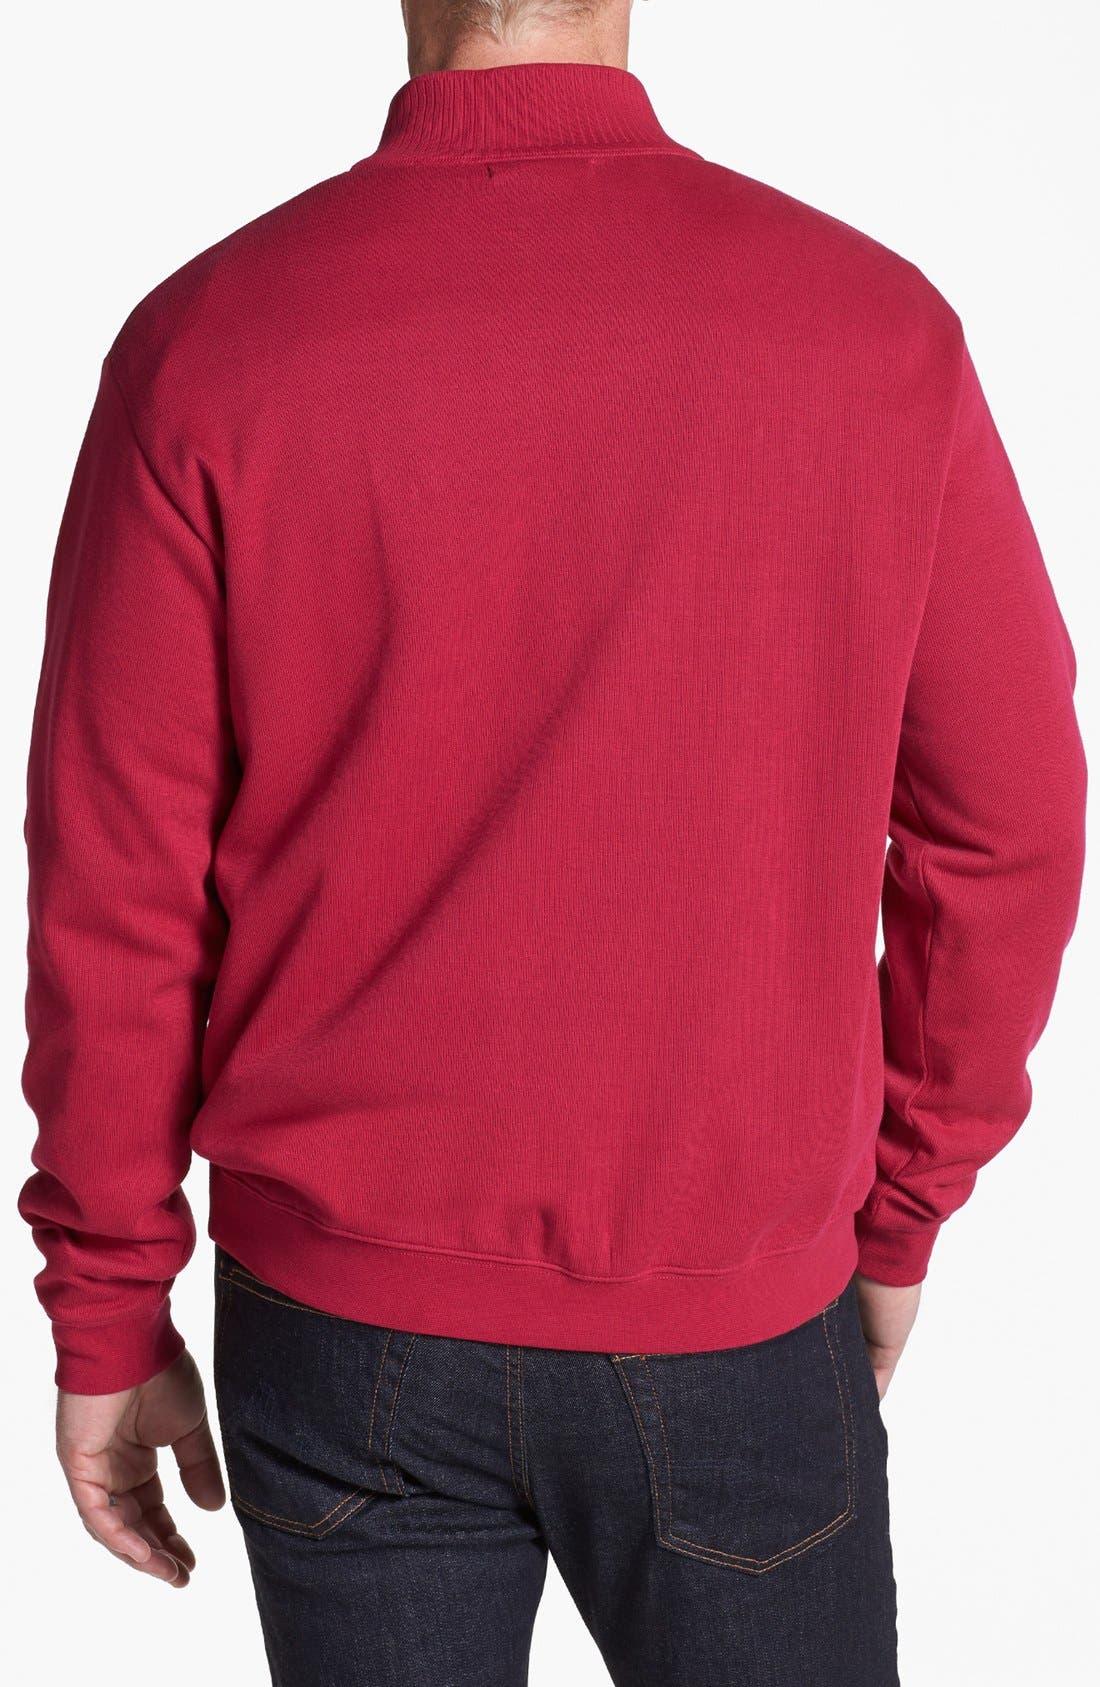 Alternate Image 2  - Cutter & Buck 'Flatback' Pullover Sweatshirt (Big & Tall)